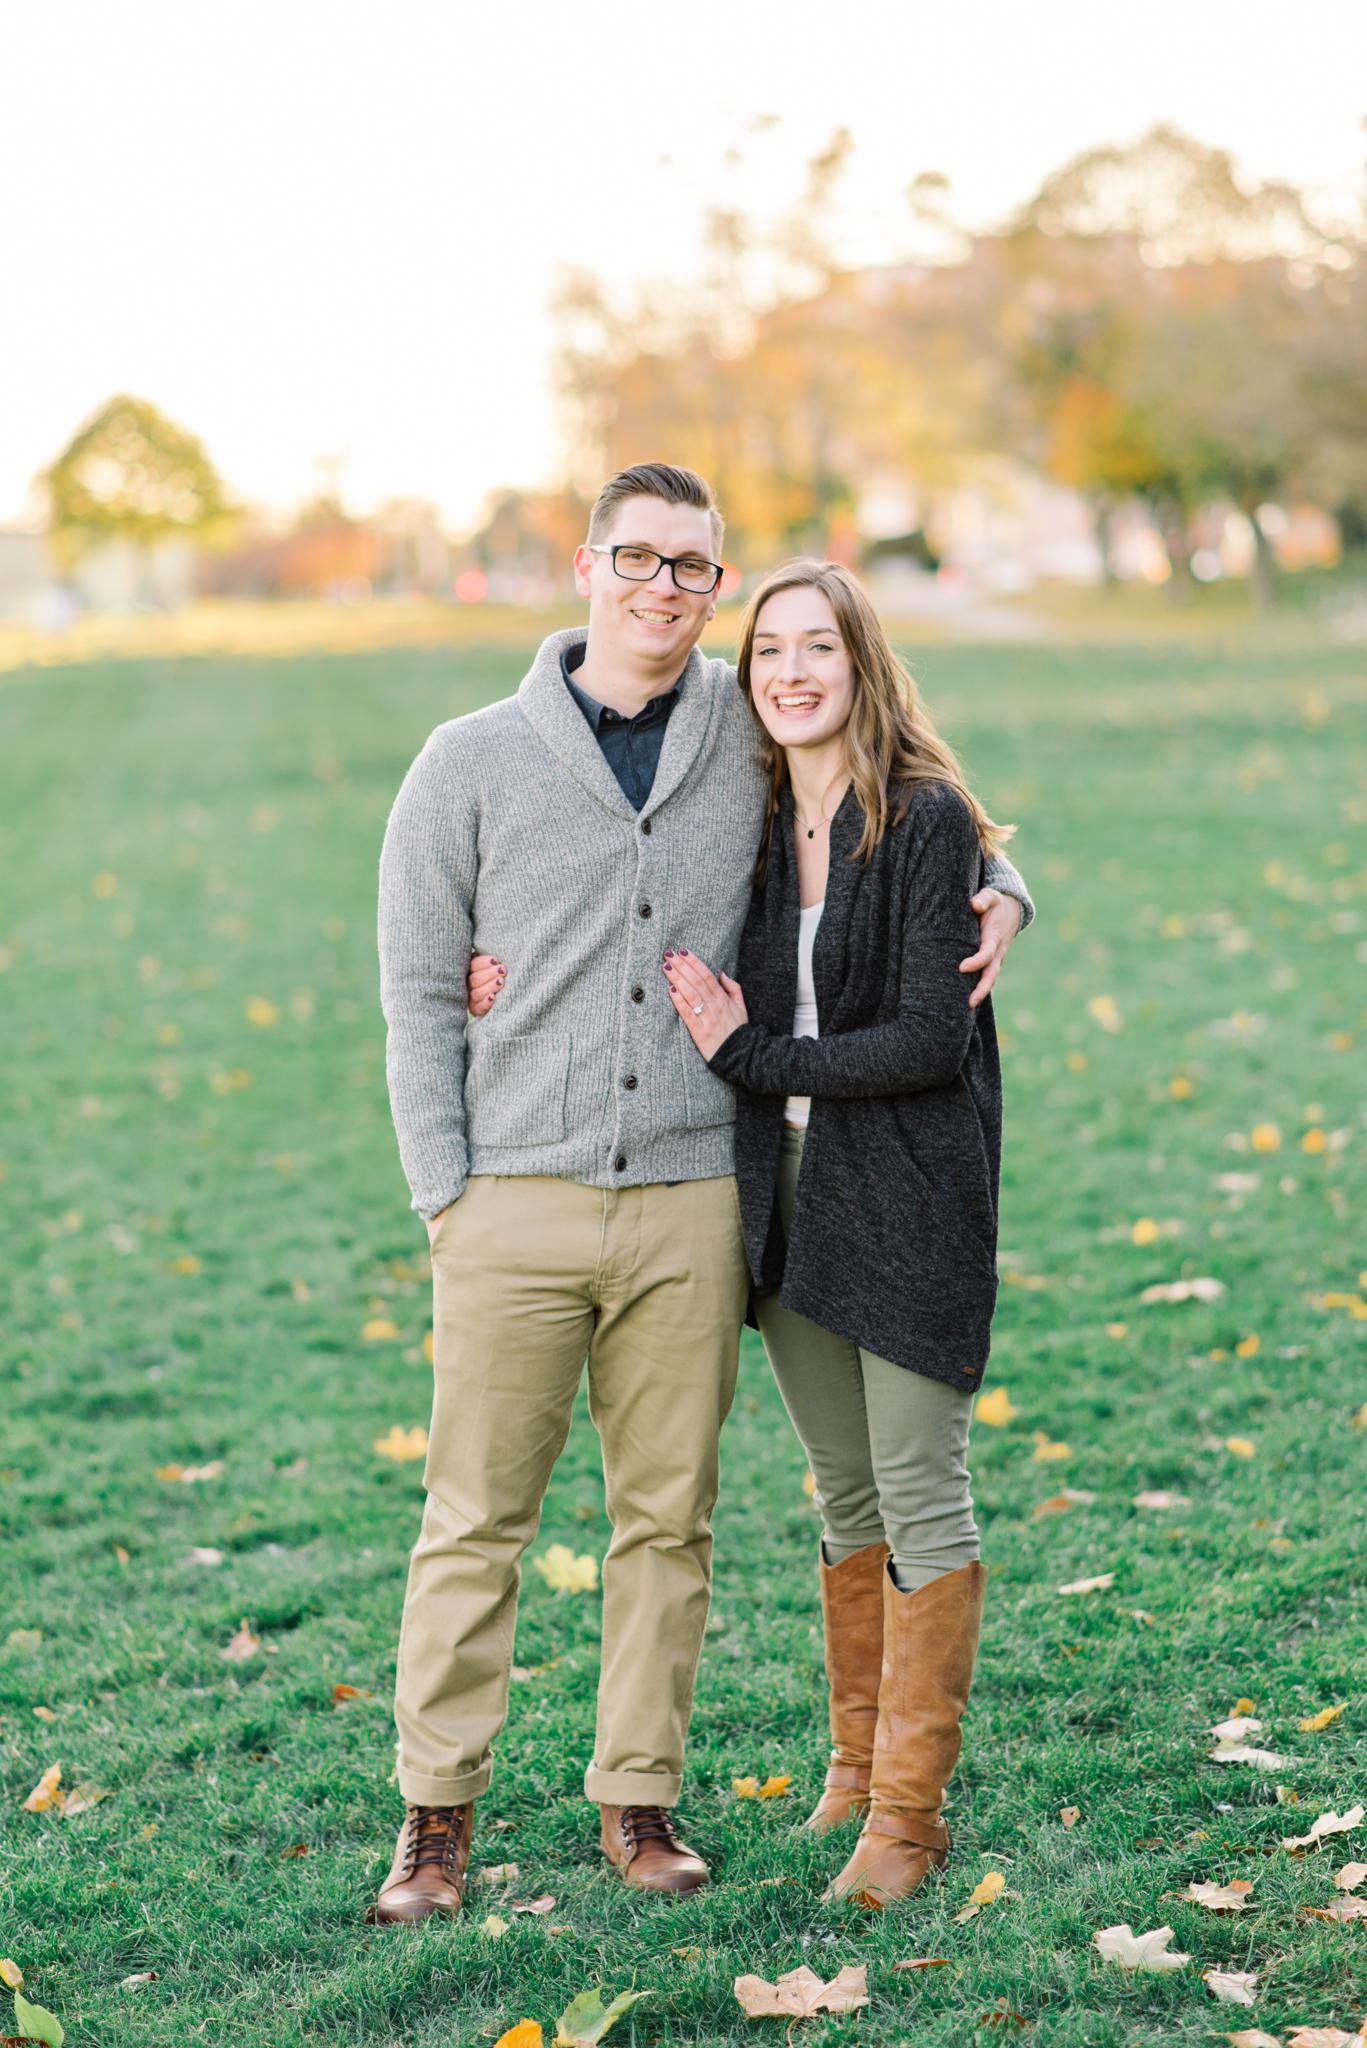 Justine & Mark - Hamilton Wedding Photographer-8.jpg